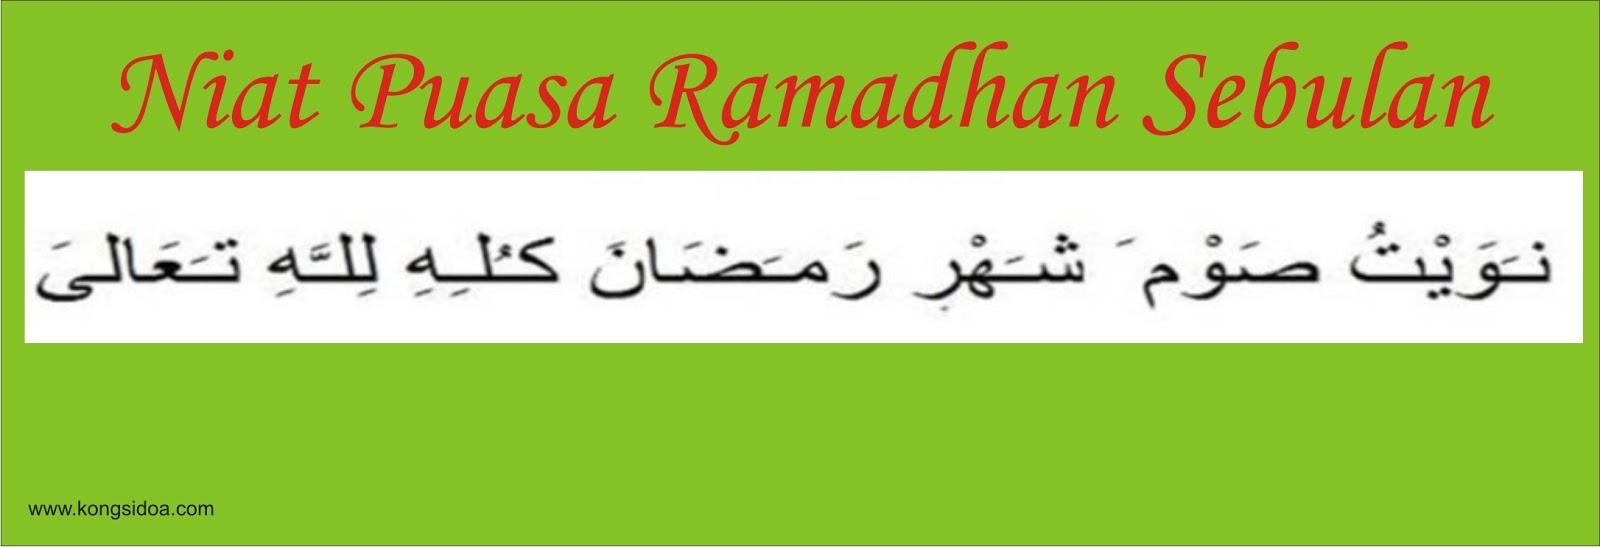 niat sebulan puasa, niat sebulan puasa rumi,  niat puasa ramadhan, cara niat puasa, niat buka puasa, niat puasa isnin, niat puasa sunat, niat puasa sebulan bulan ramadhan rumi